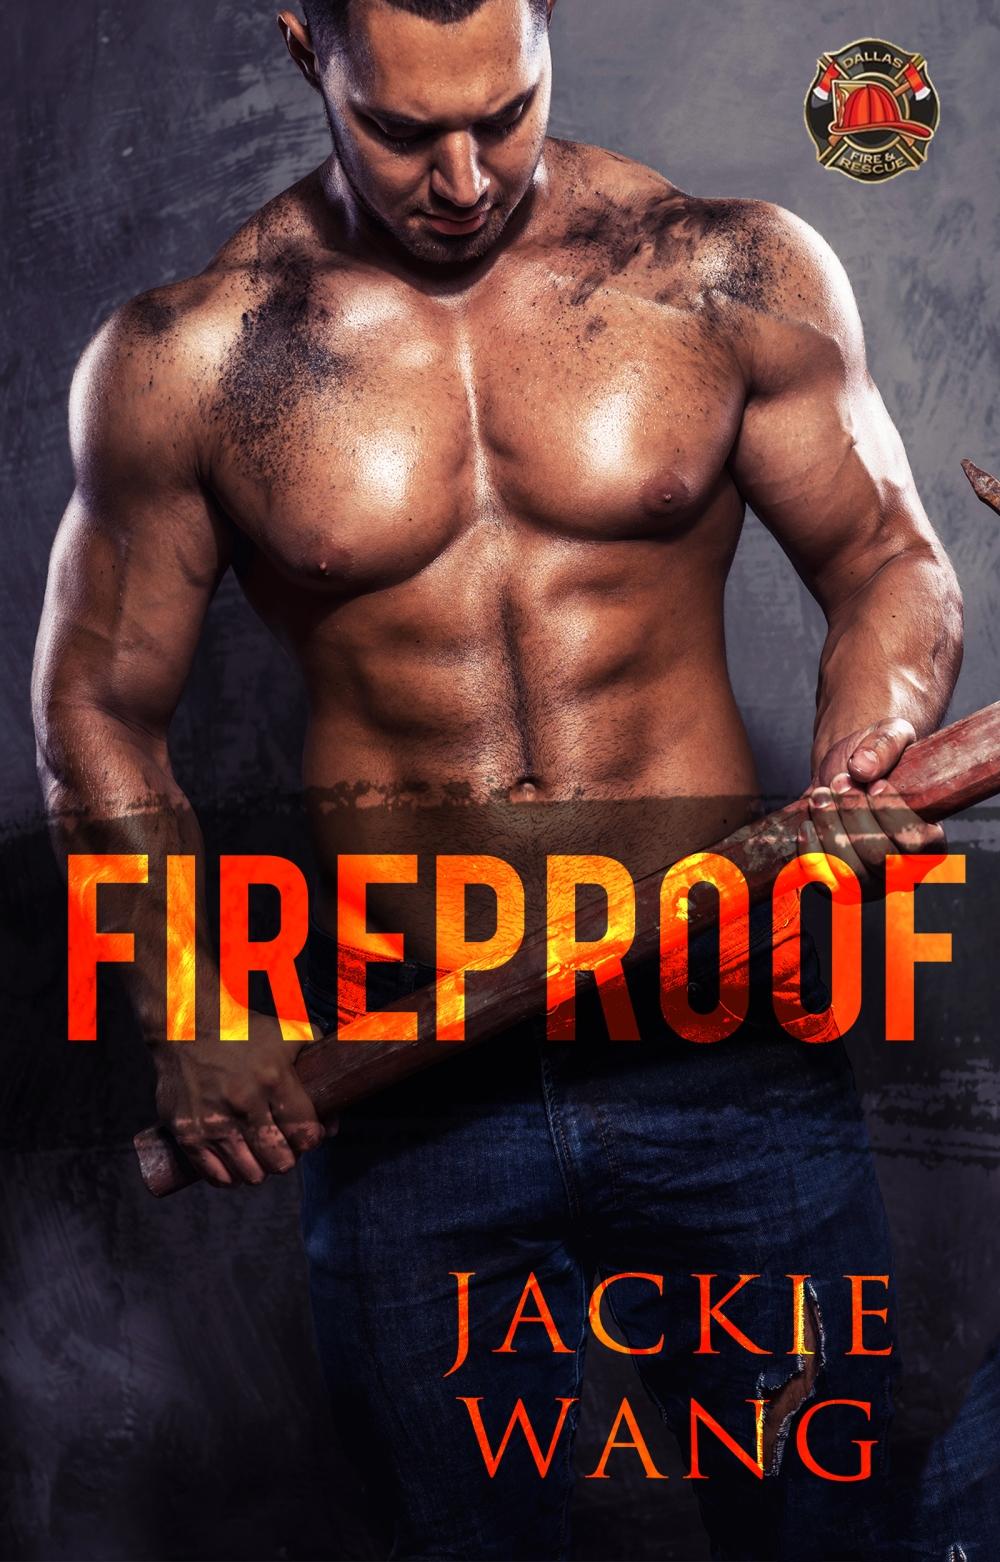 FireproofAugust